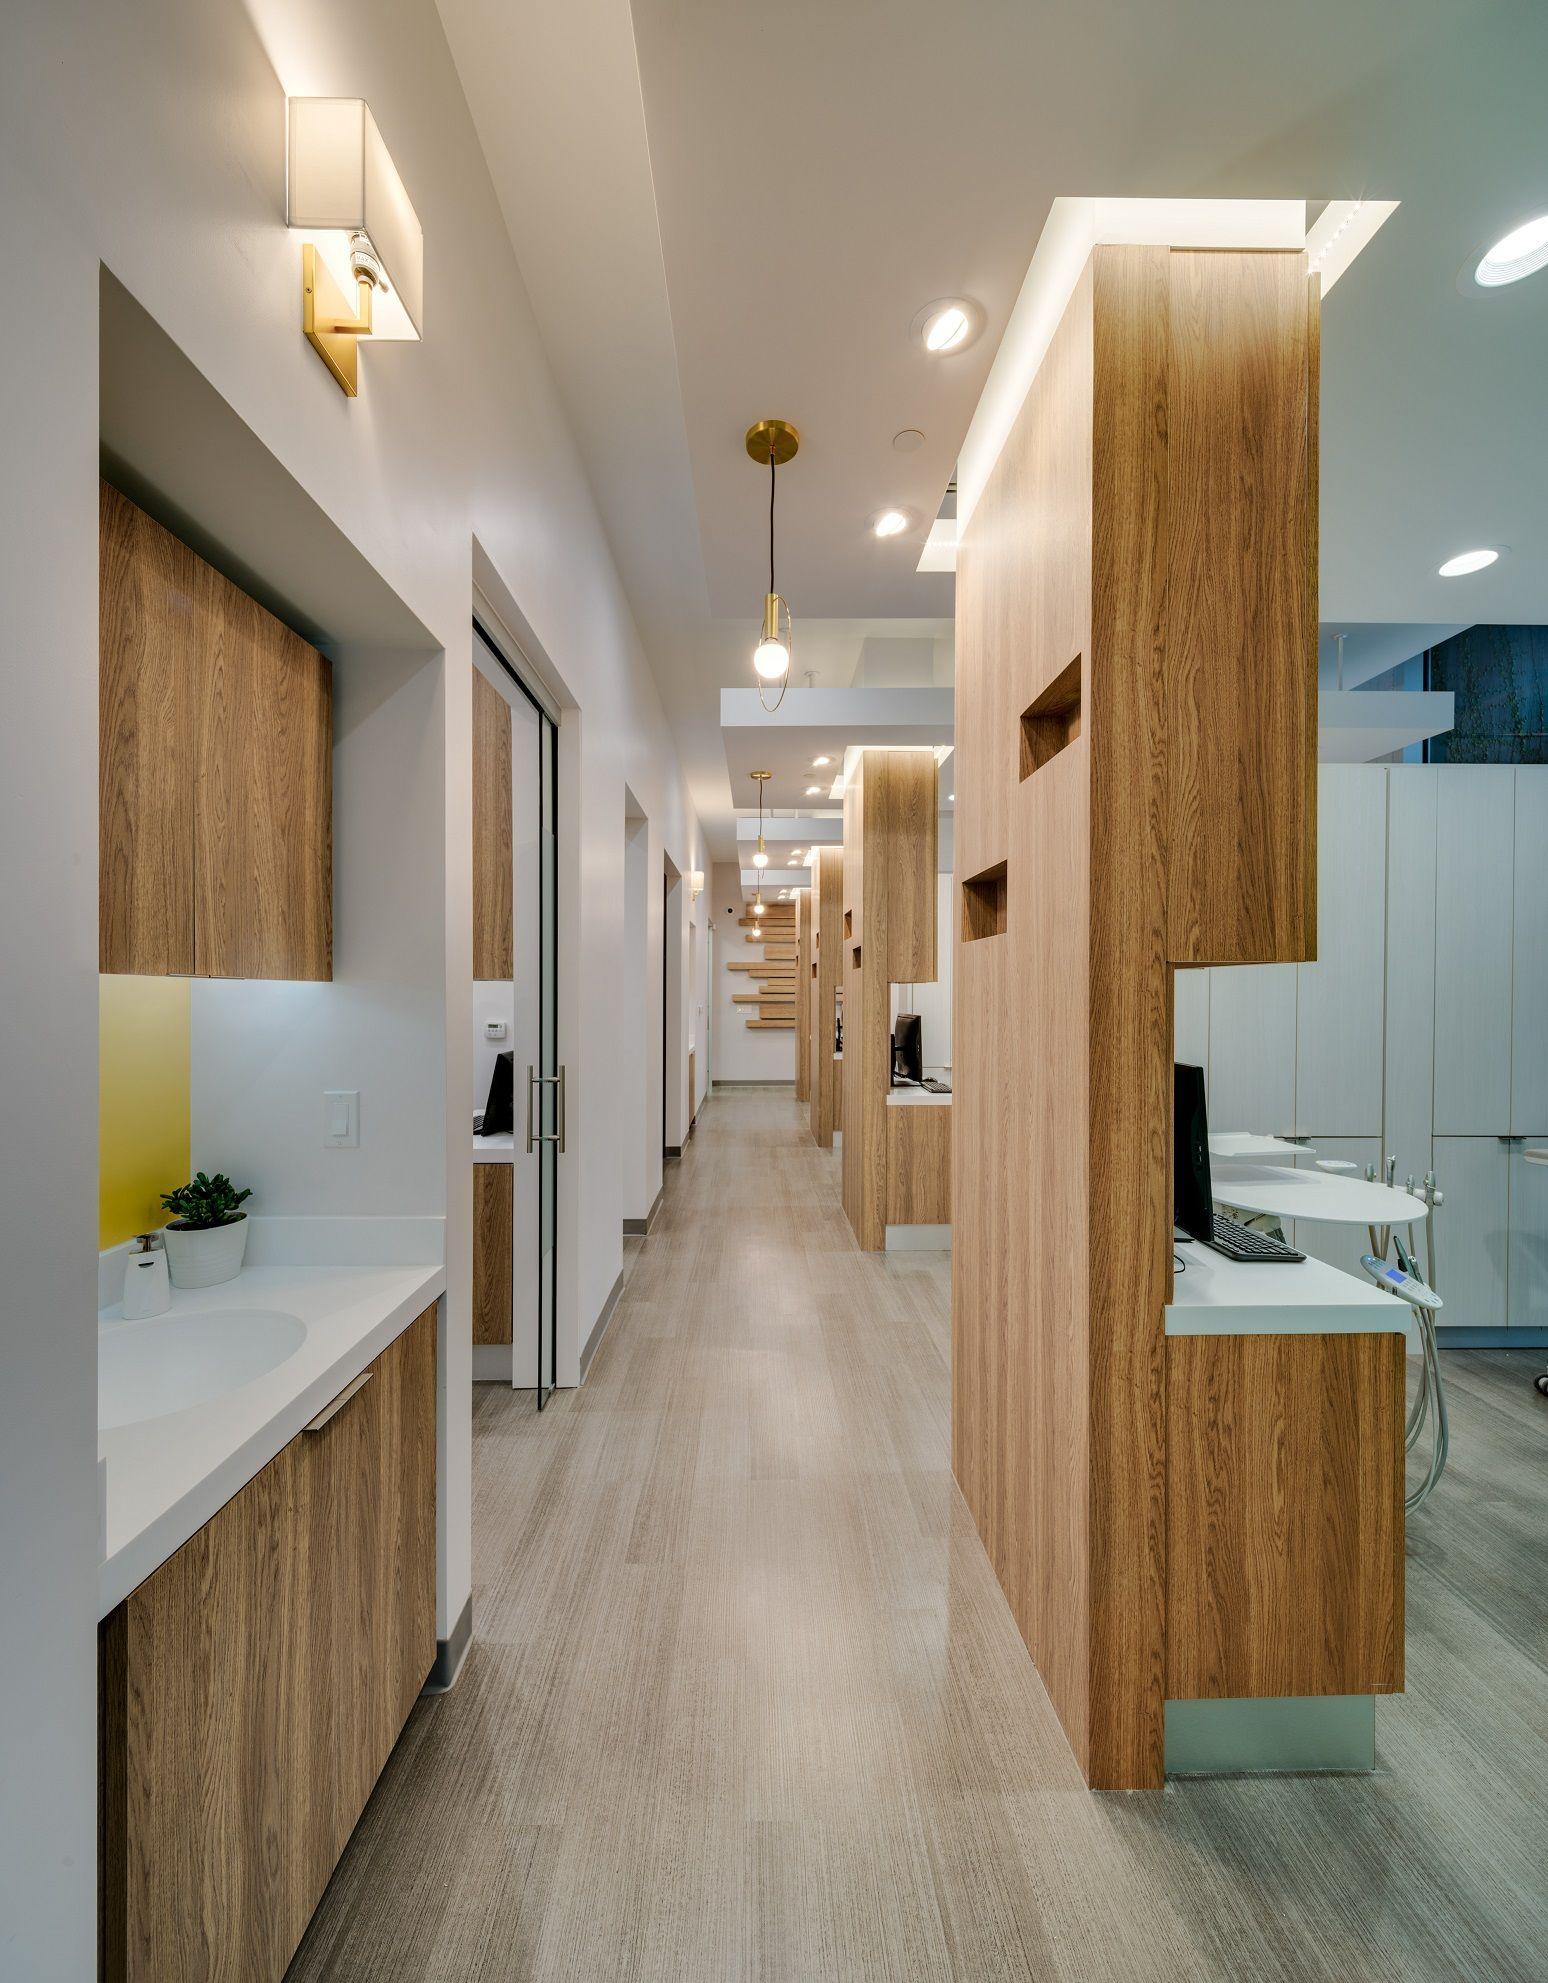 15+ Leader animal specialty hospital ideas